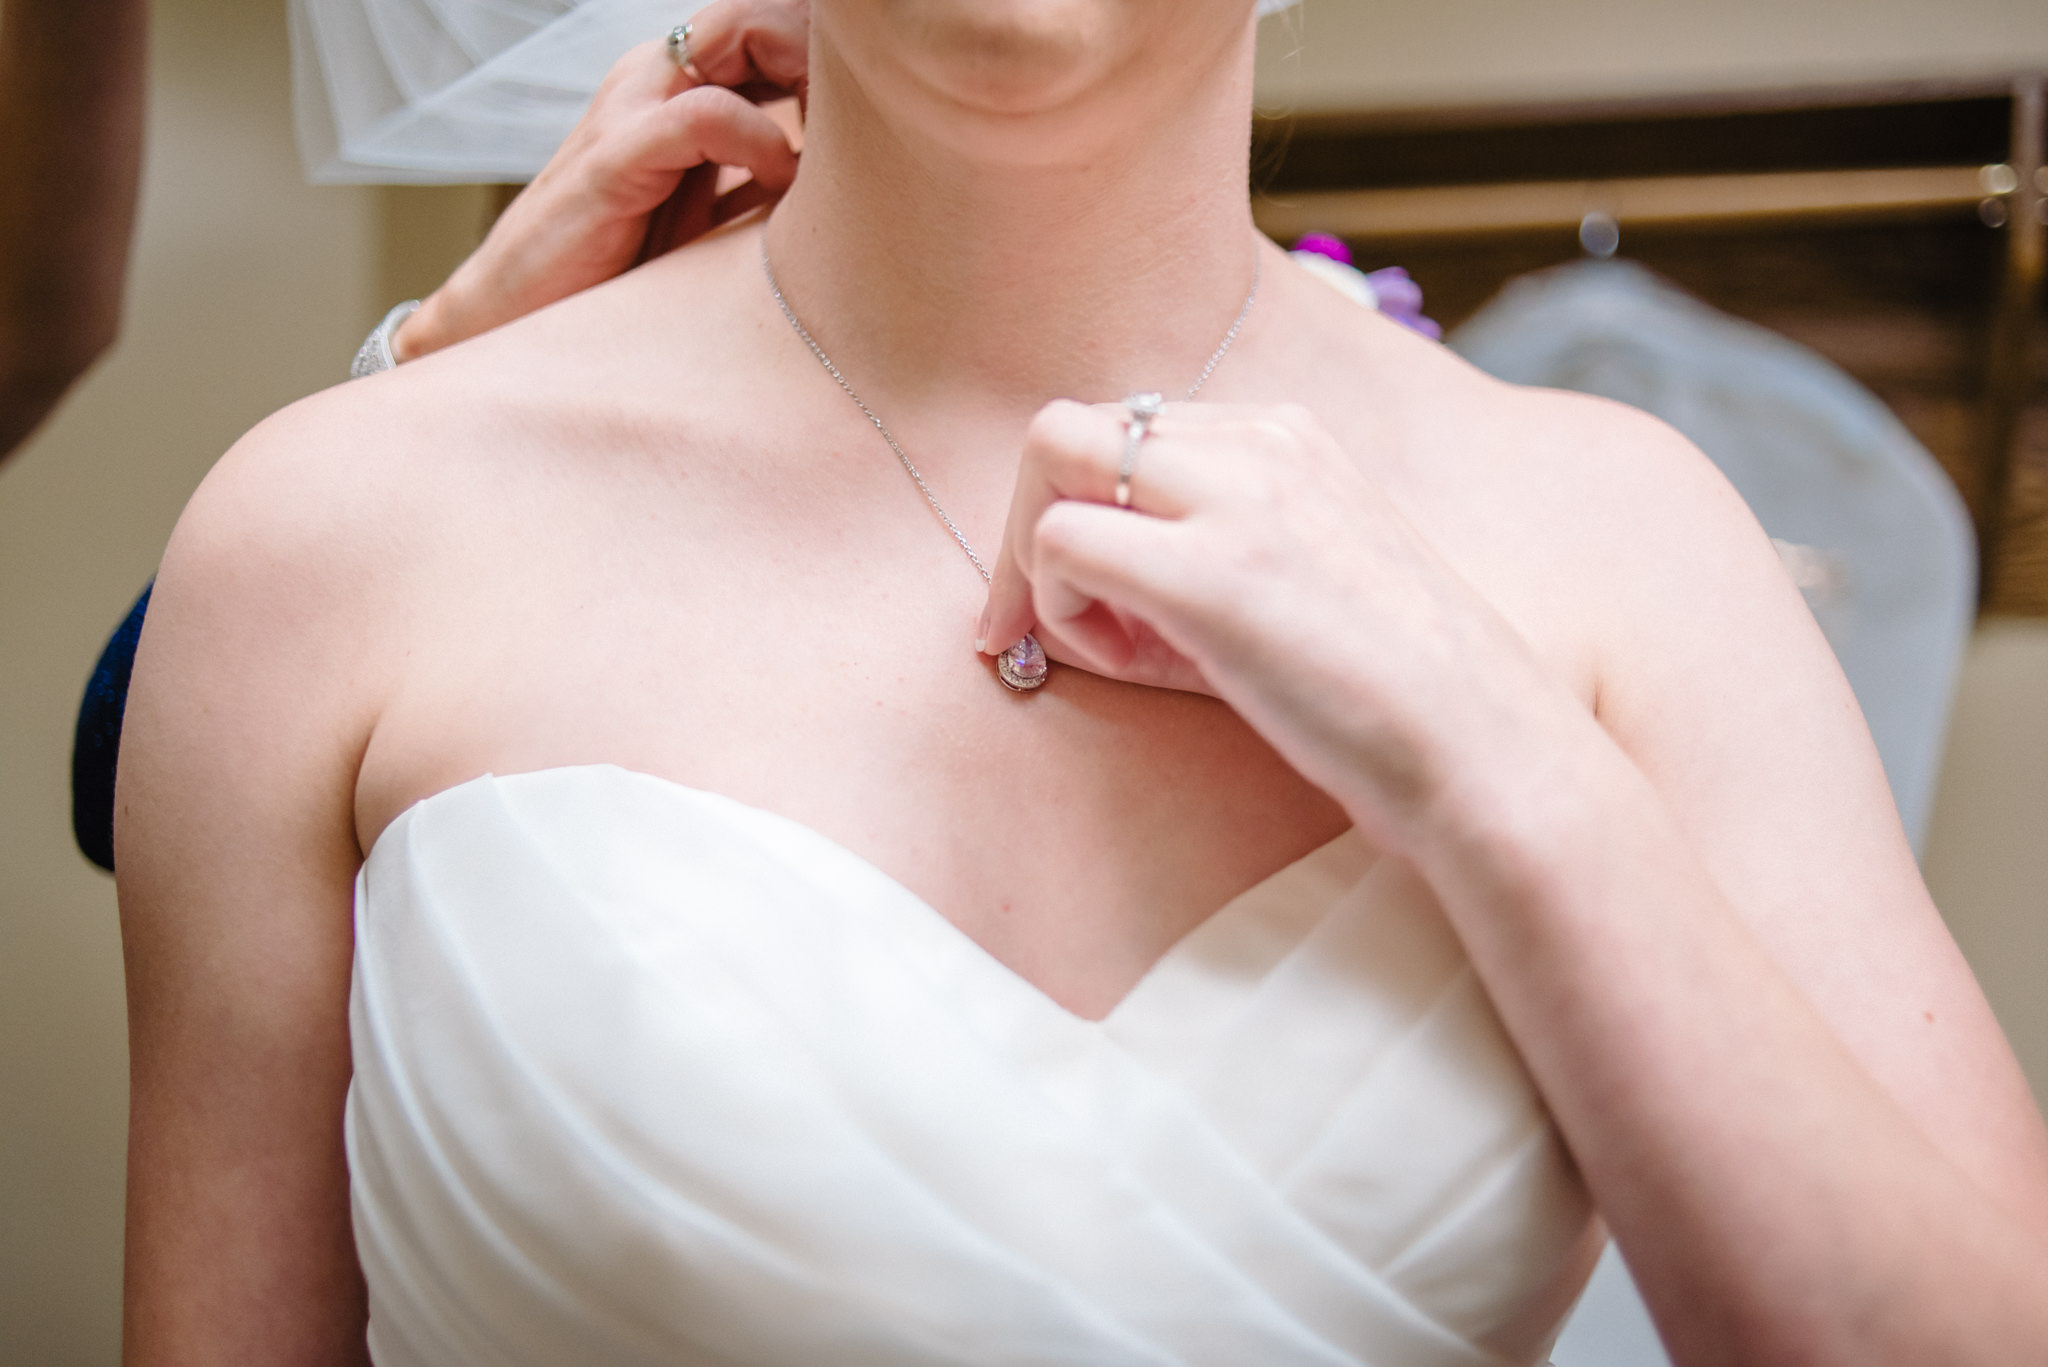 OMAHA-MARRIOTT-WEDDING-DOWNTOWN-MARRIOTT-OMAHA-WEDDING-PHOTOGRAPHER-JM-STUDIOS-009.jpg